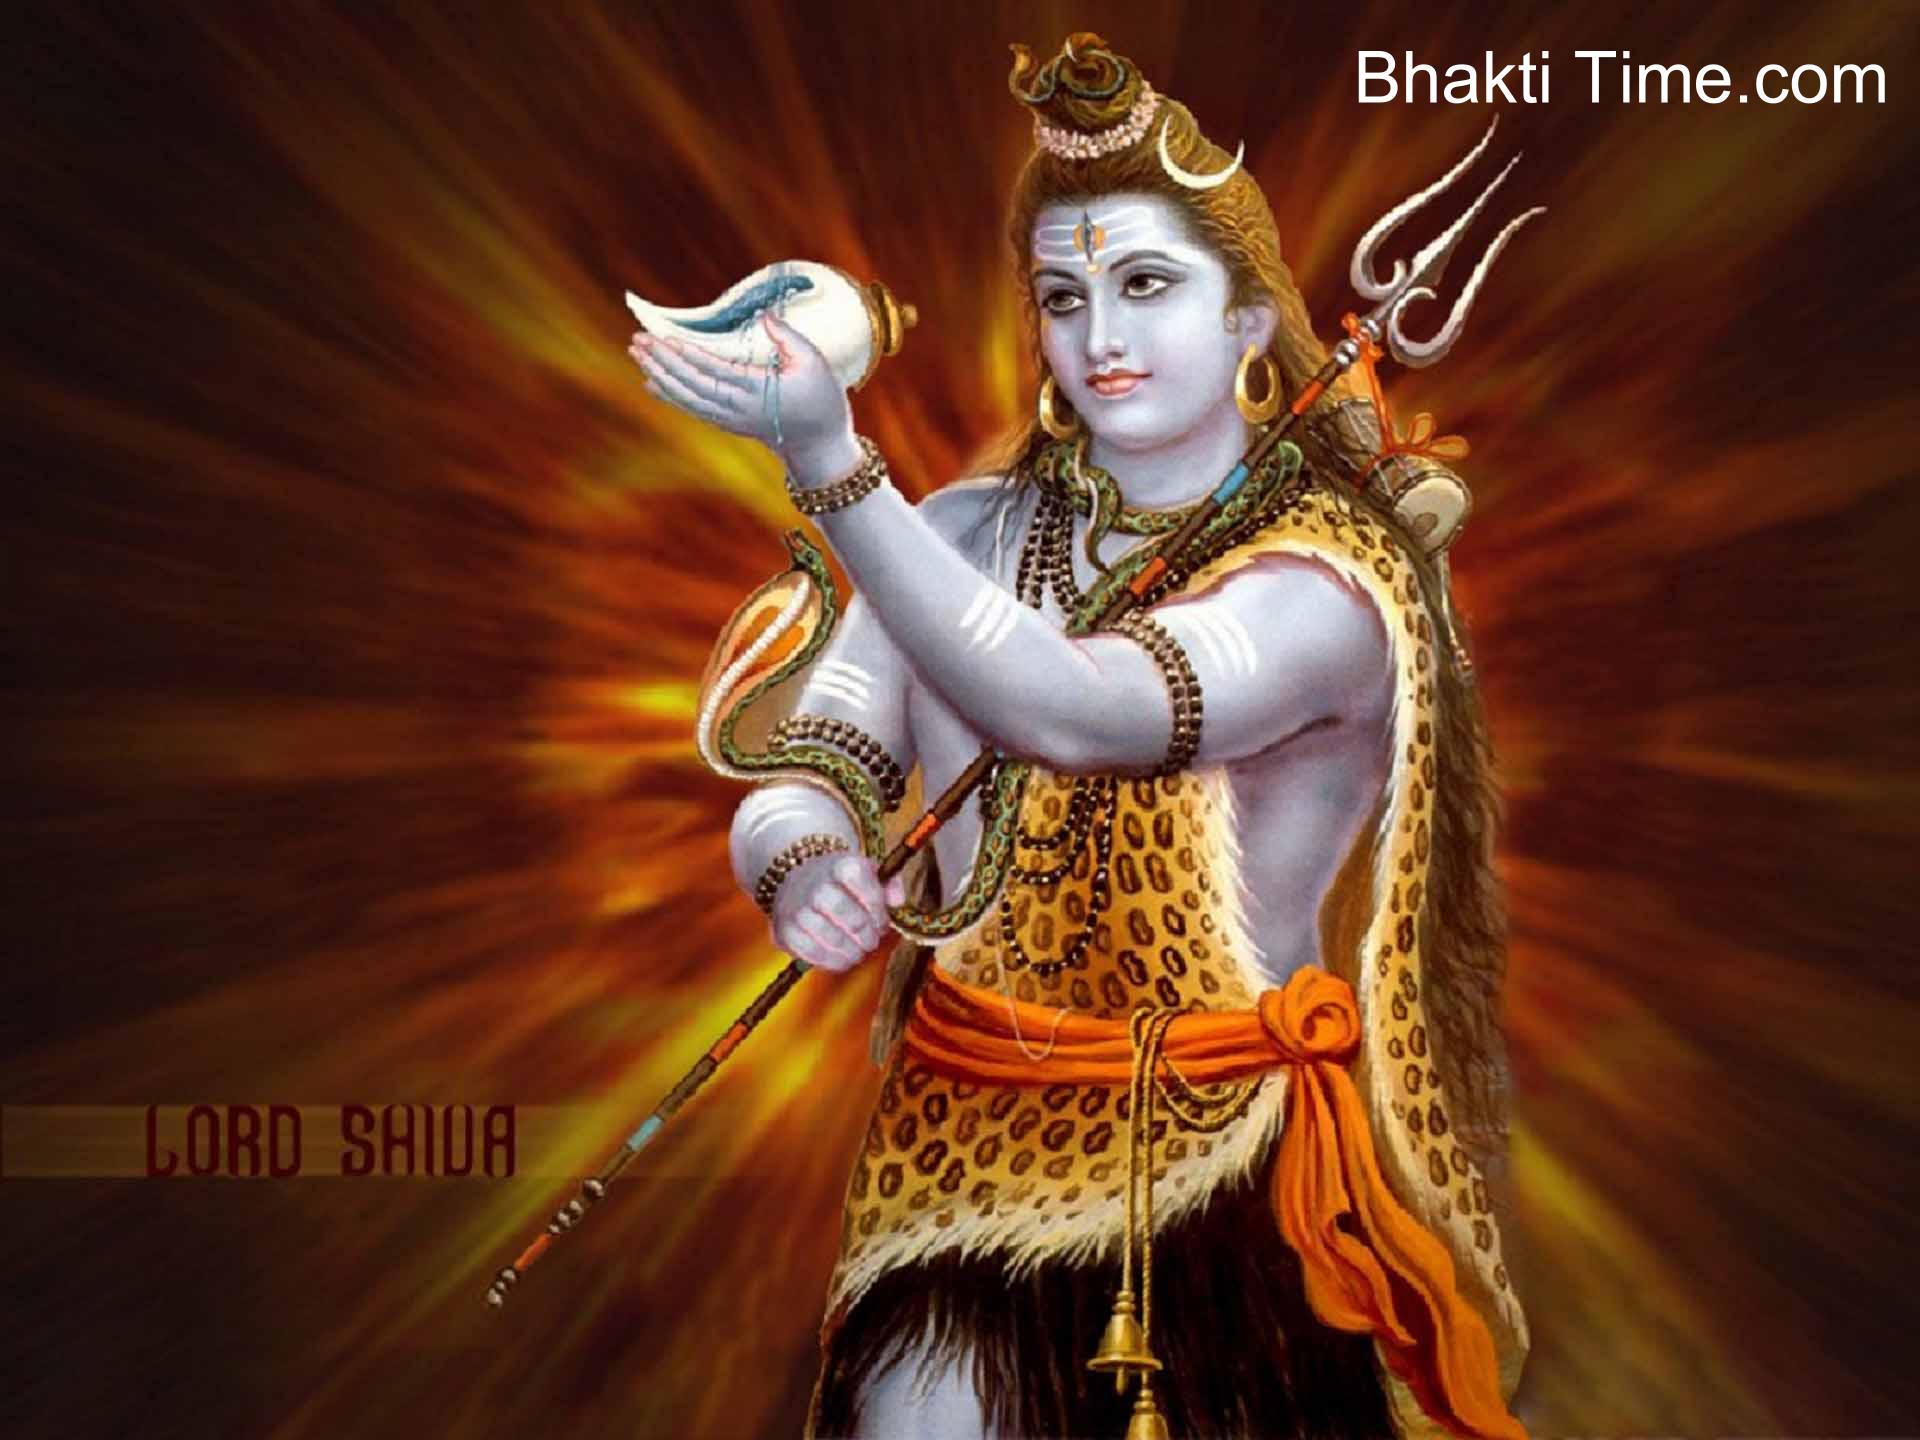 Lord-Shiva-neelkanth